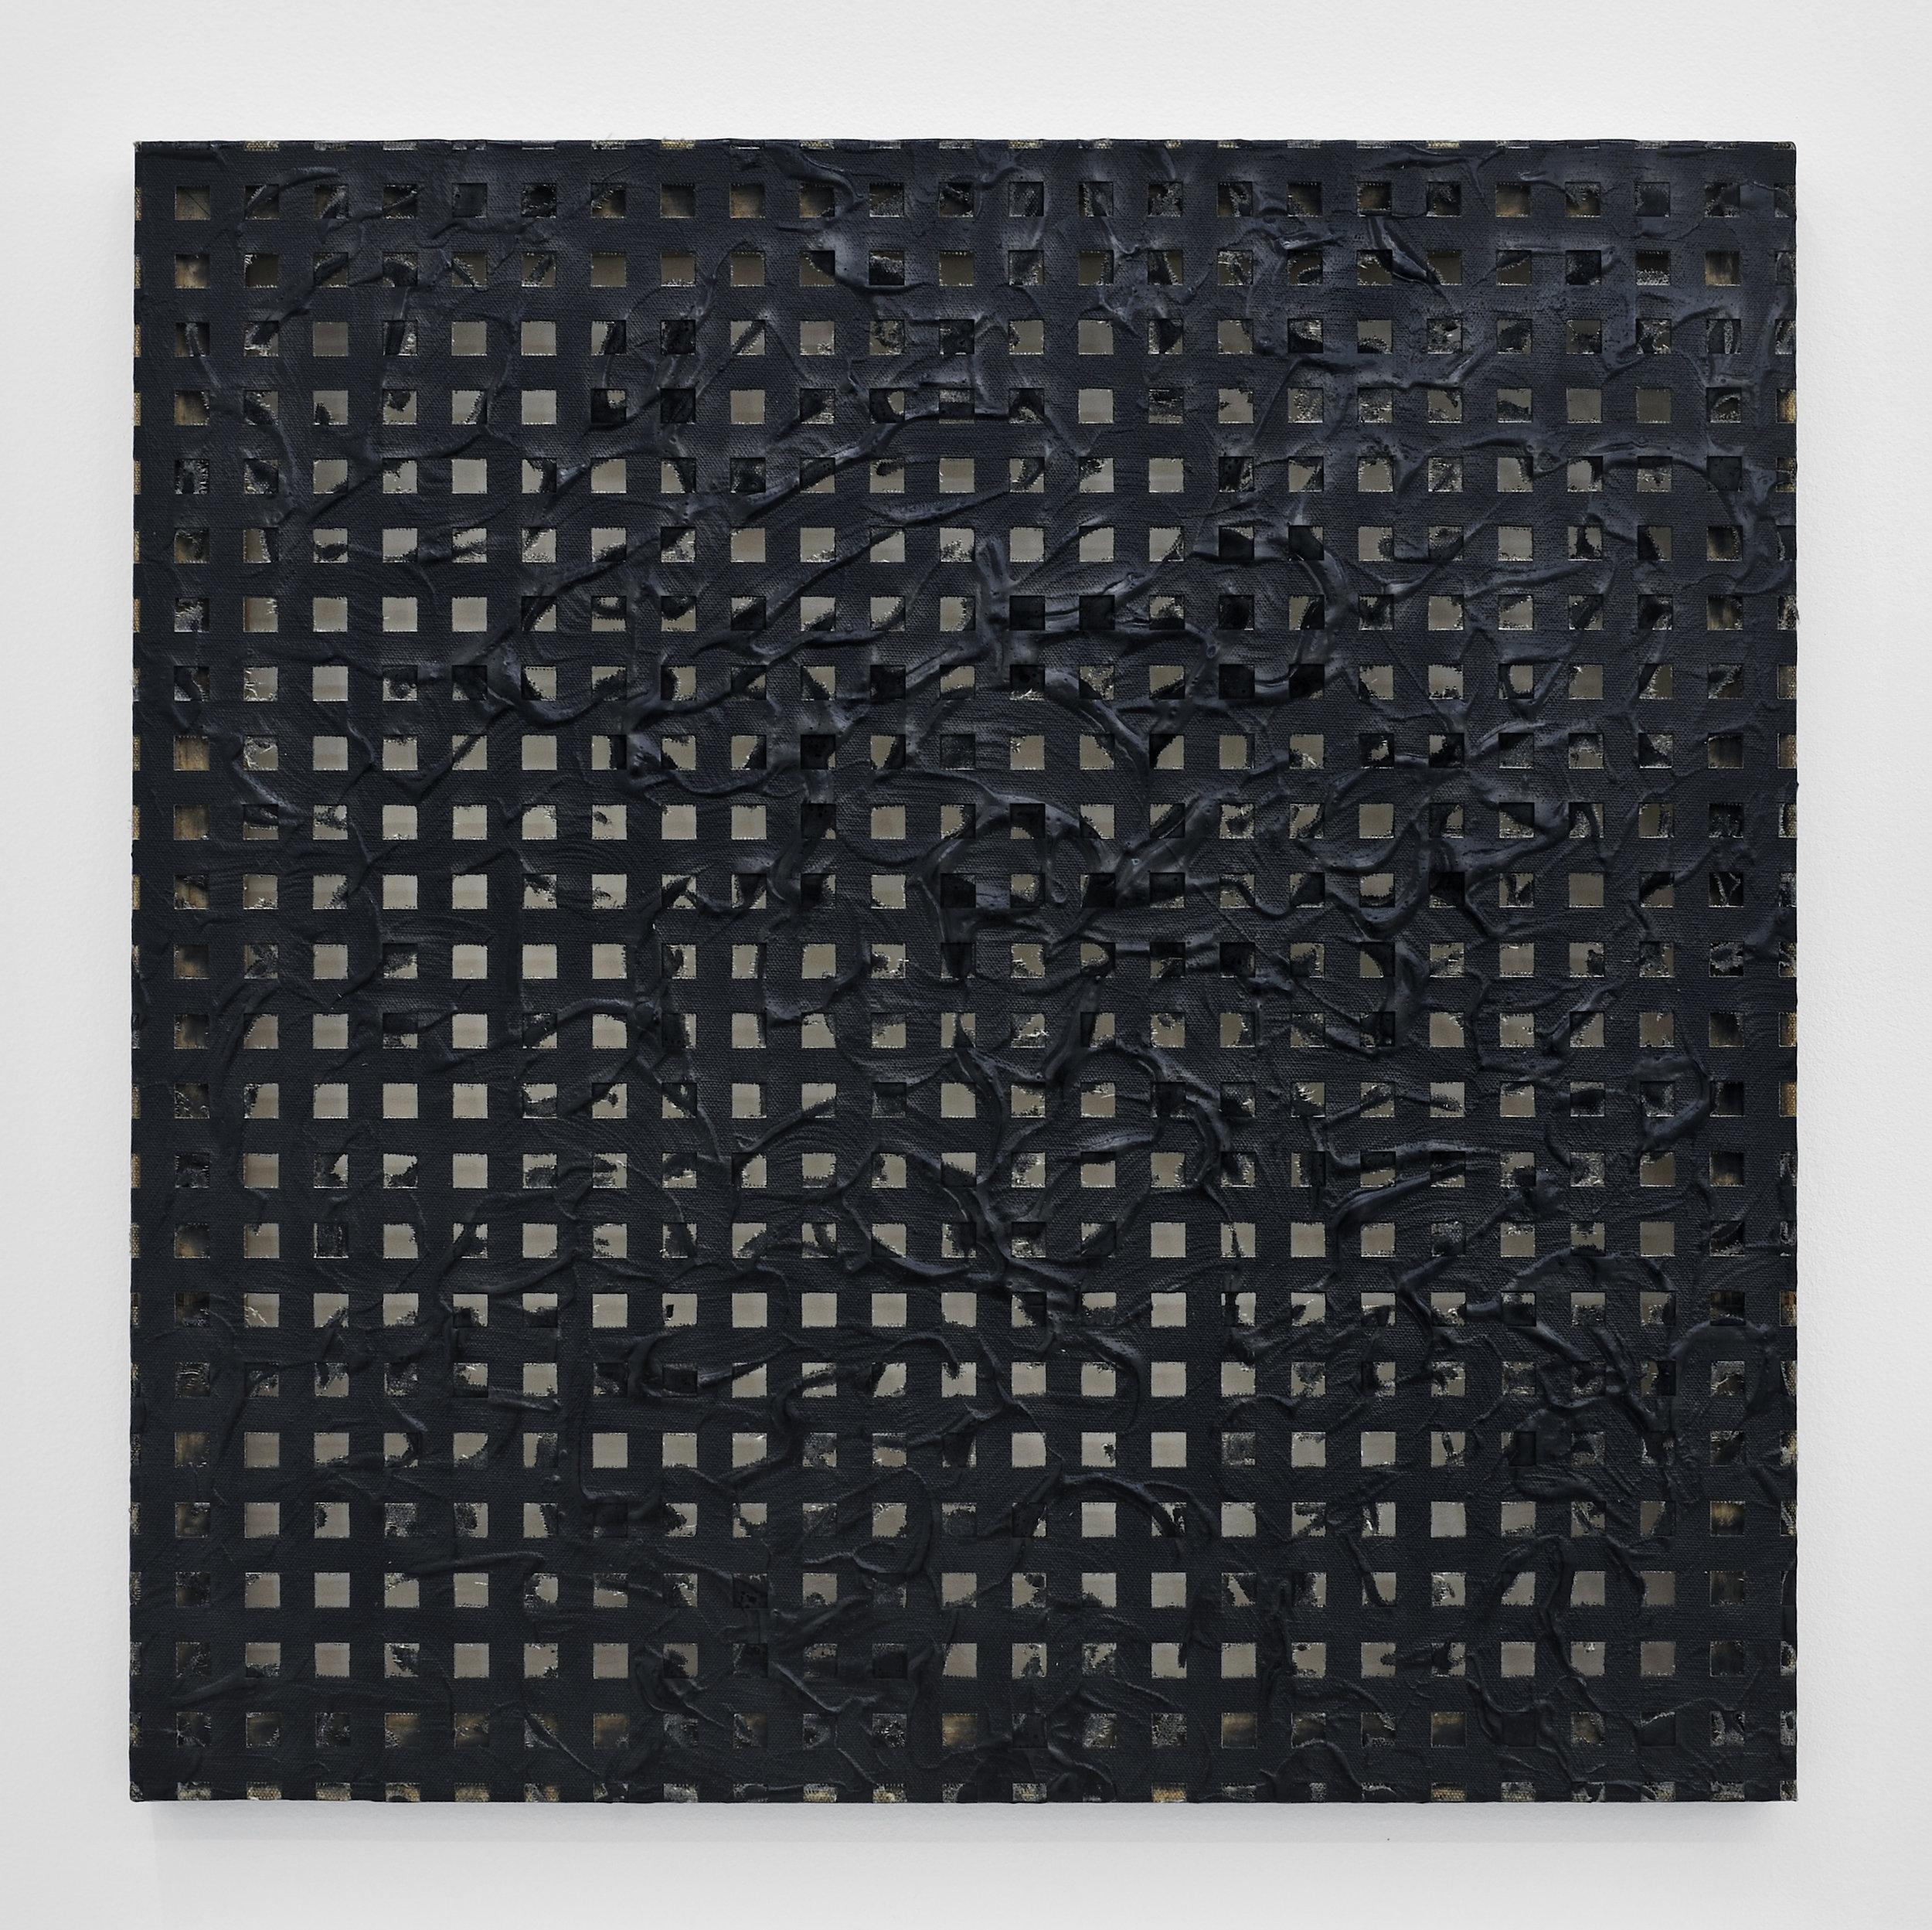 Erosion (Grid) #2, 2011 laser-carved acrylic on canvas 61 x 61 x 4 cm - 24 x 24 x 1 1/2 inches